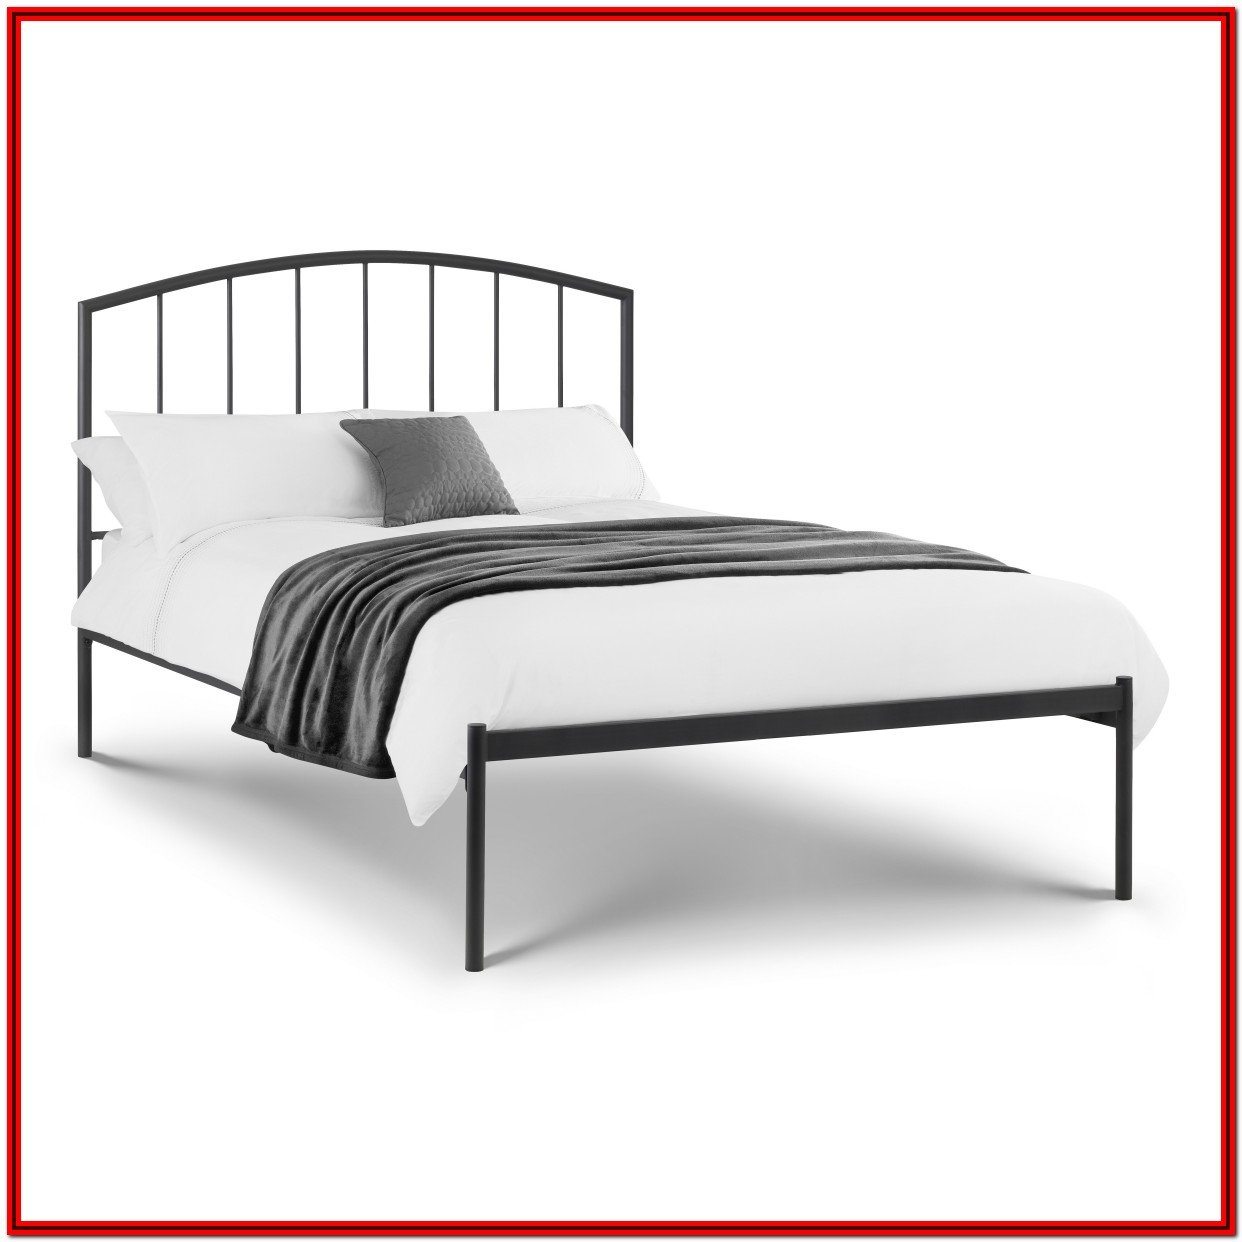 Metal Bed Frame King Size Uk